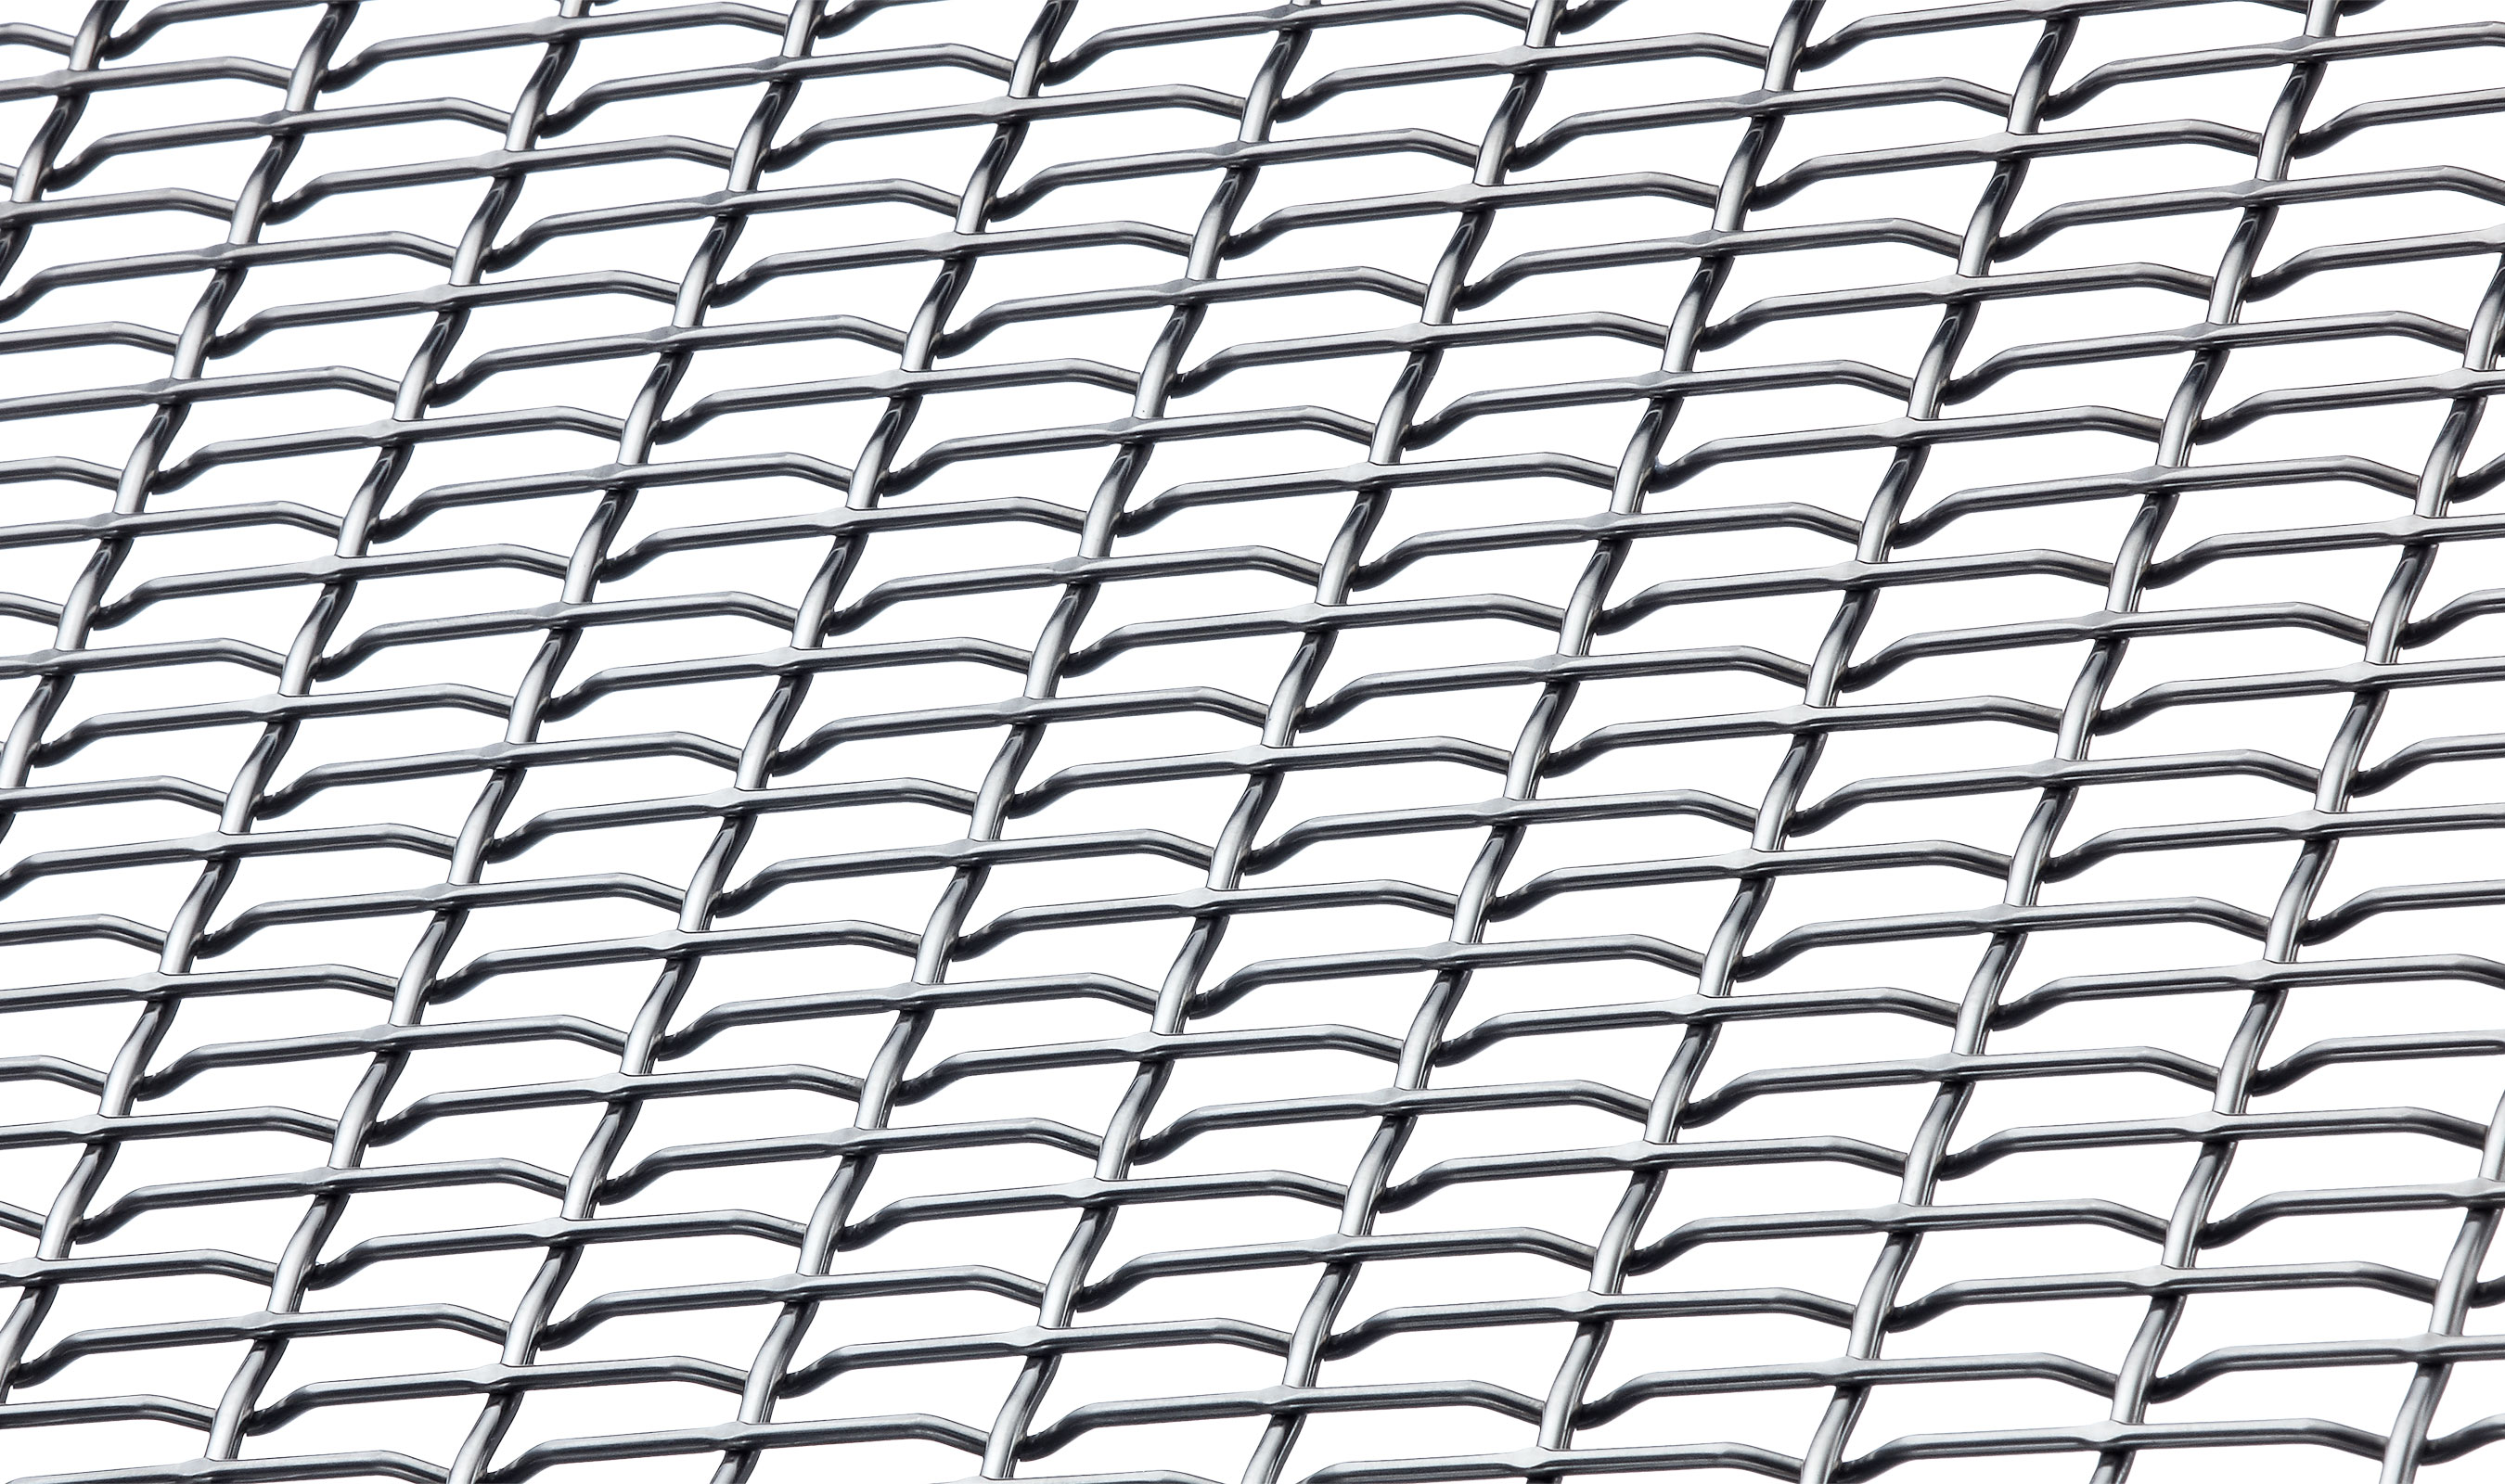 FPZ-46 Architectural wire mesh